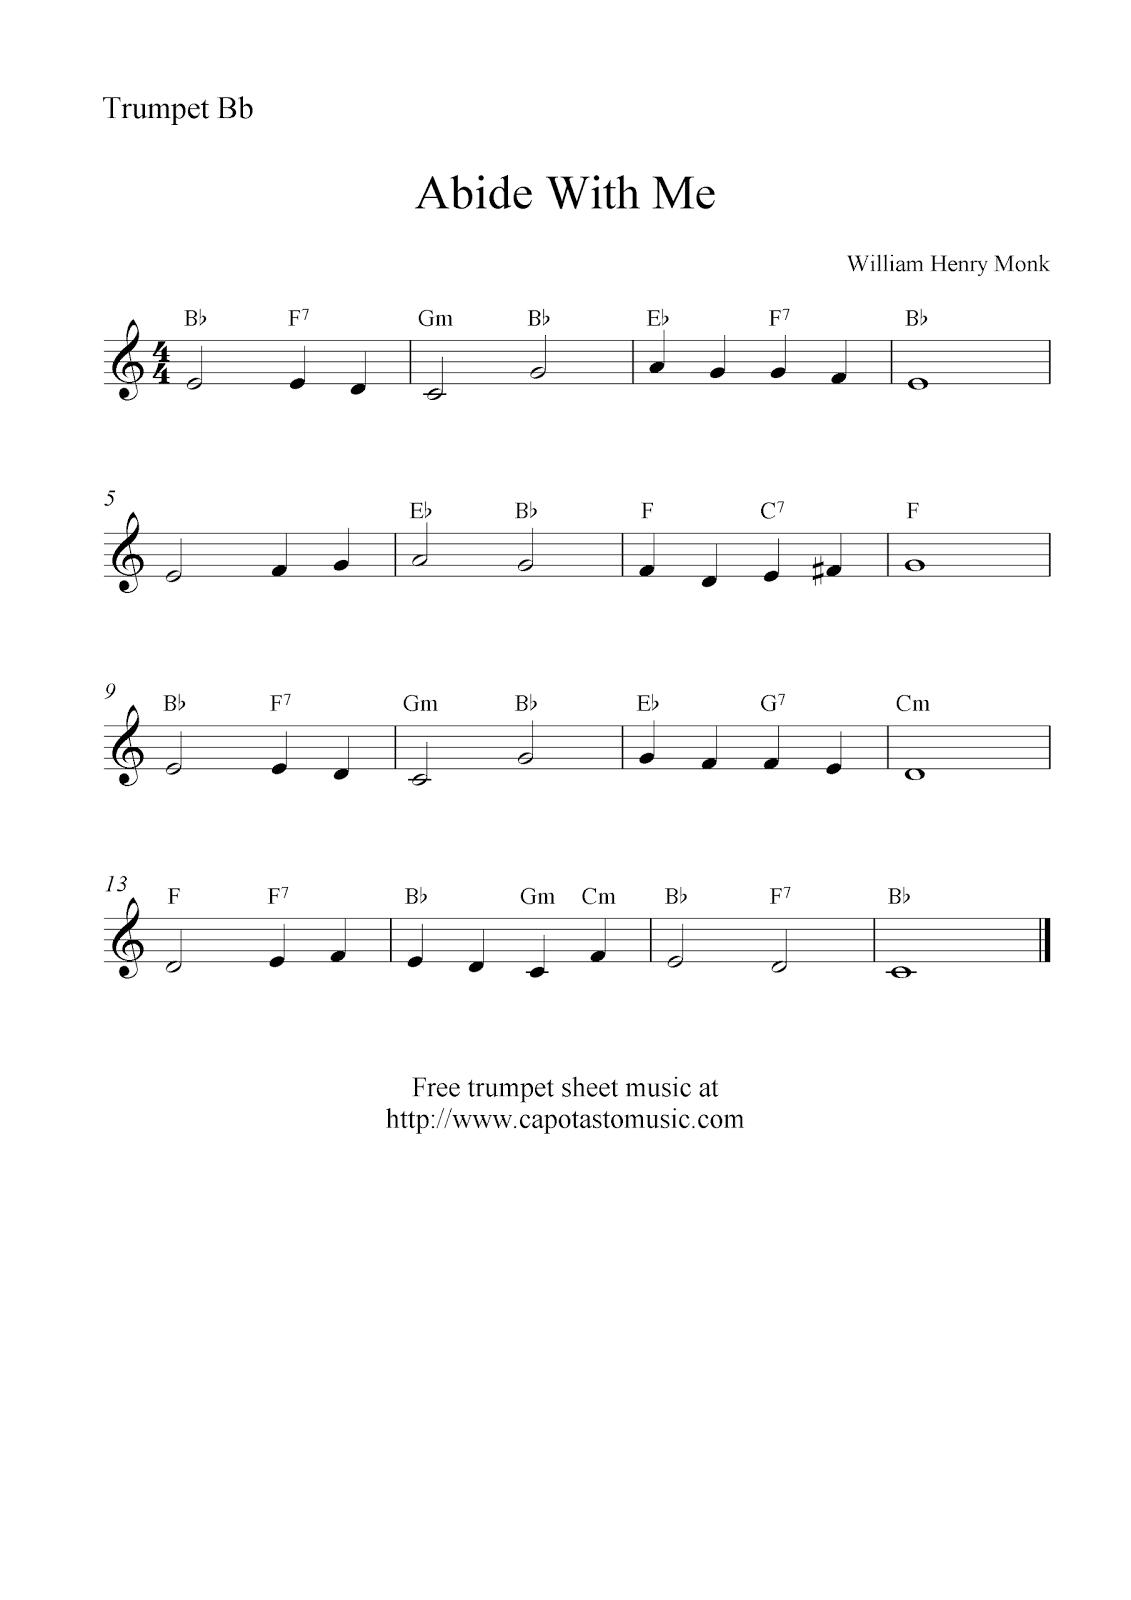 Worksheets Printable Music Theory Worksheets workbooks piano music theory worksheets free printable 100 notes staff worksheets